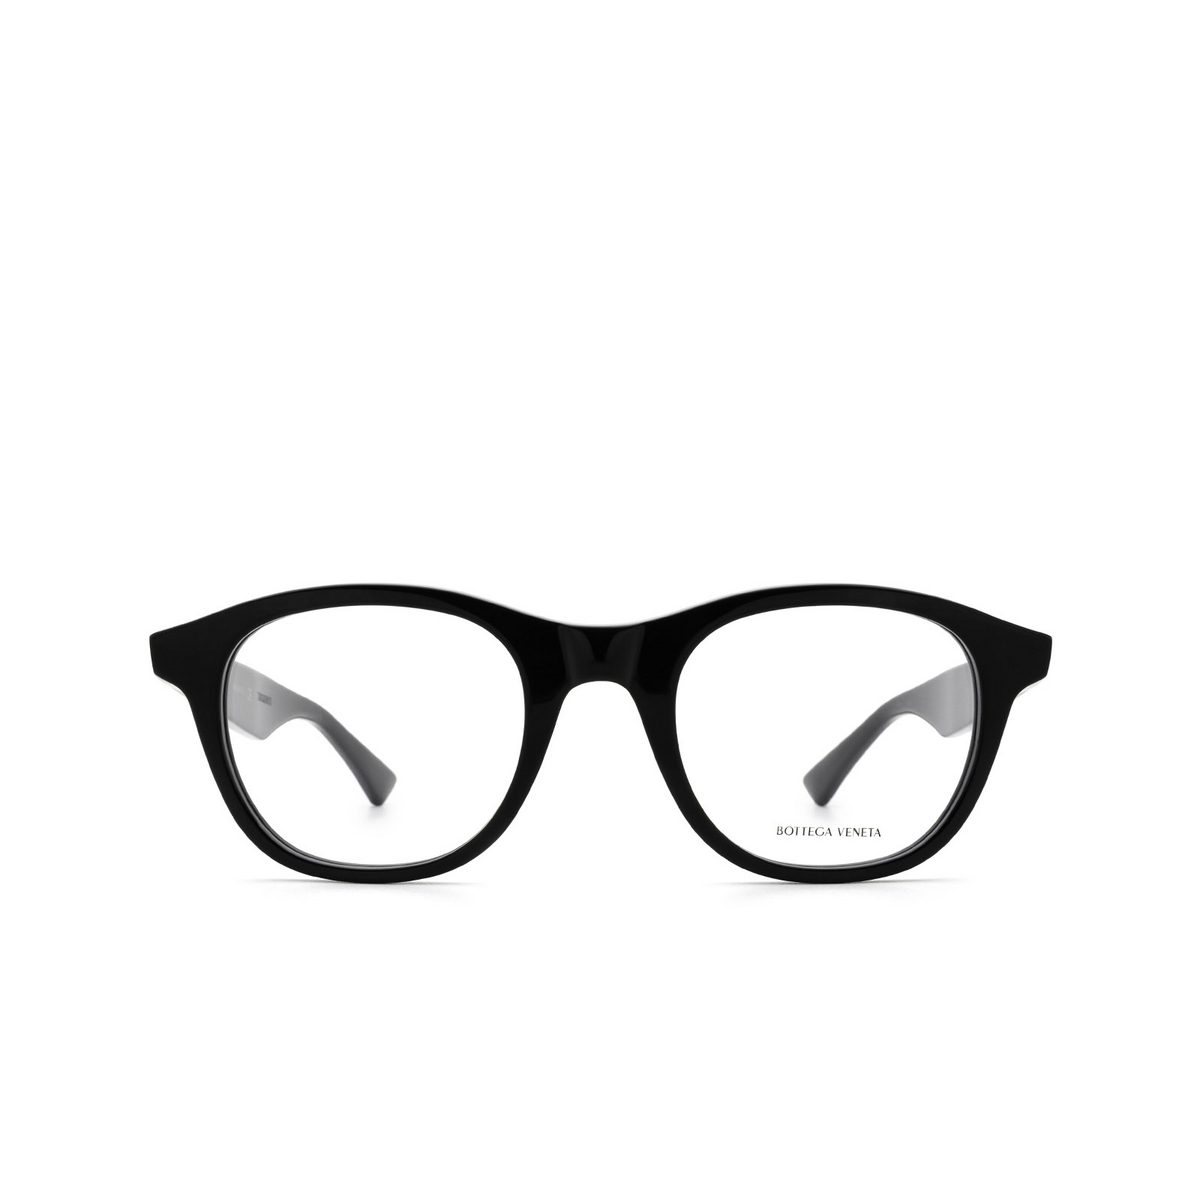 Bottega Veneta® Round Eyeglasses: BV1130O color Black 001 - front view.